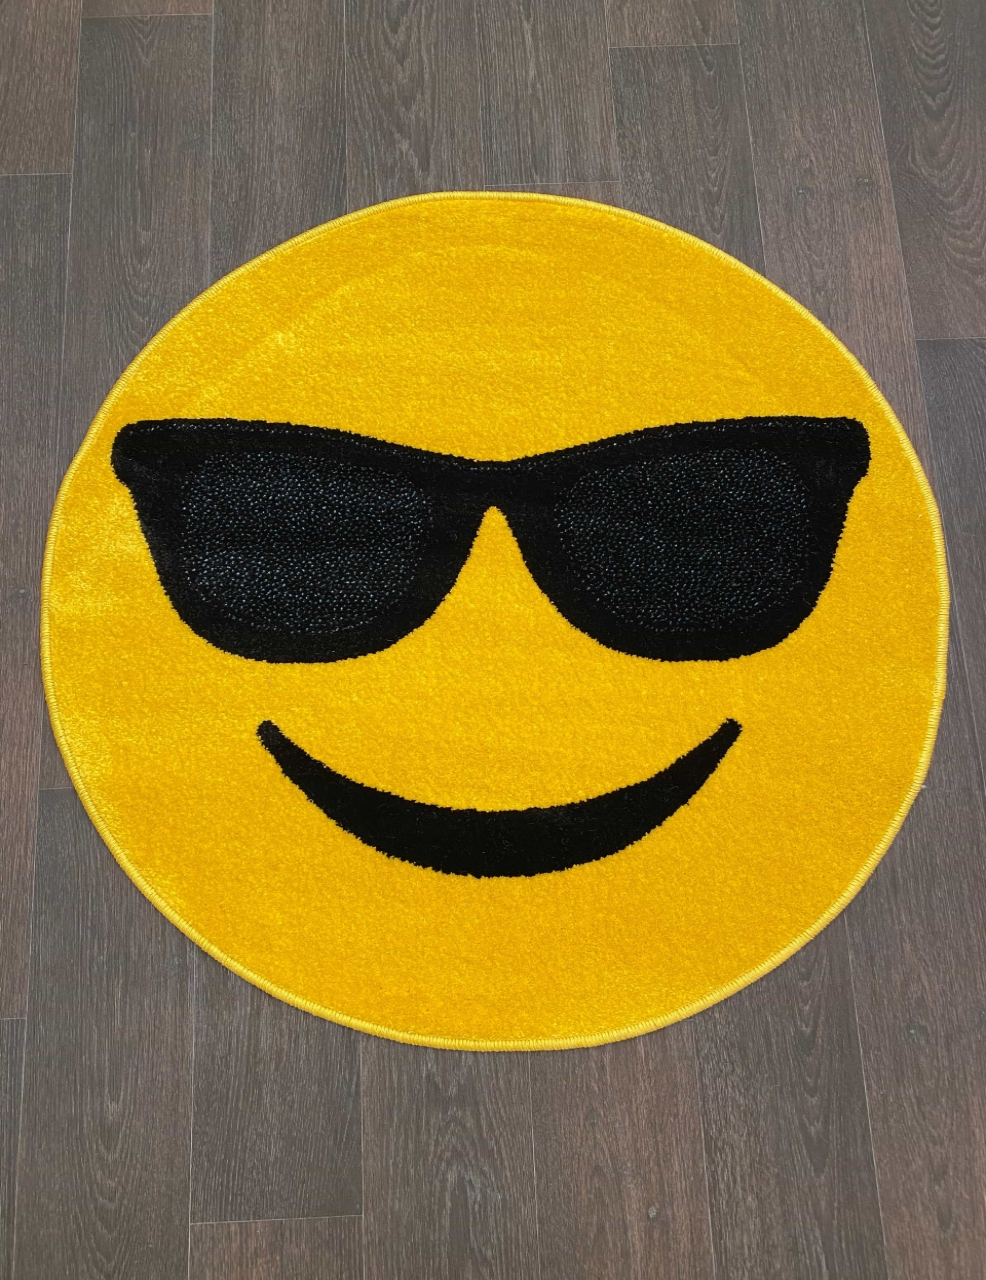 Ковер NC15 - YELLOW - Круг - коллекция SMILE - фото 1